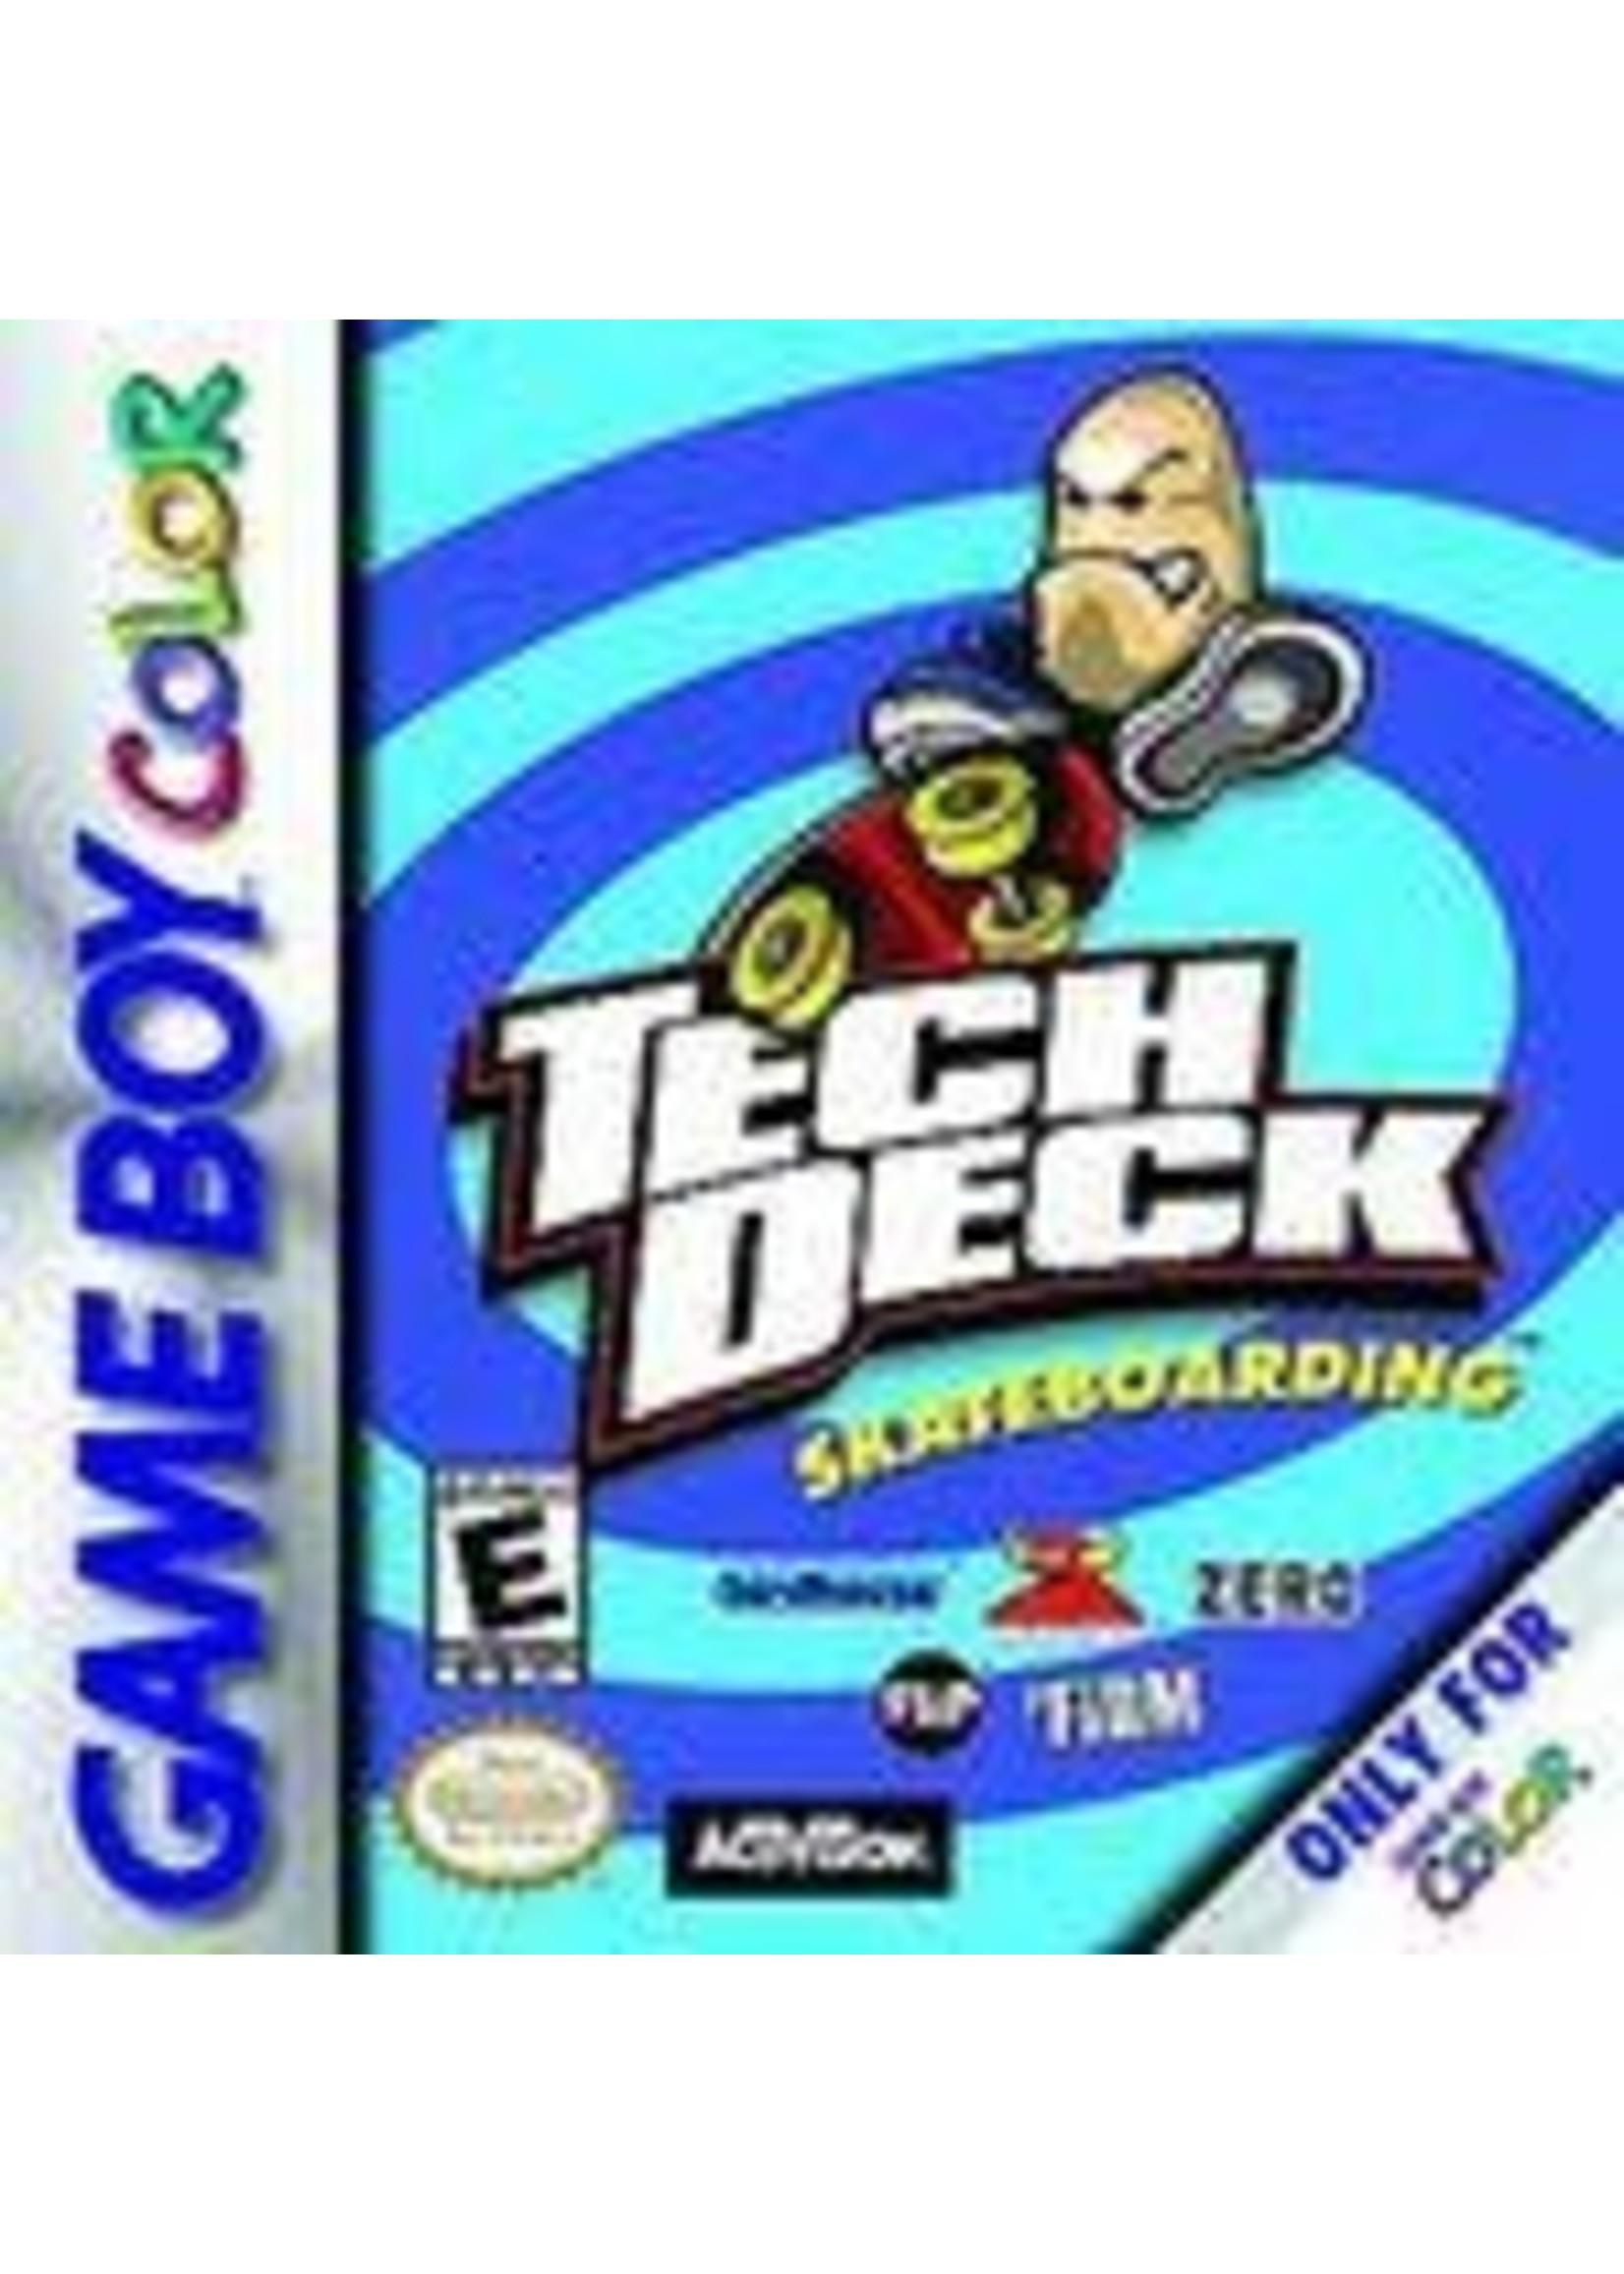 Tech Deck Skateboarding GameBoy Color